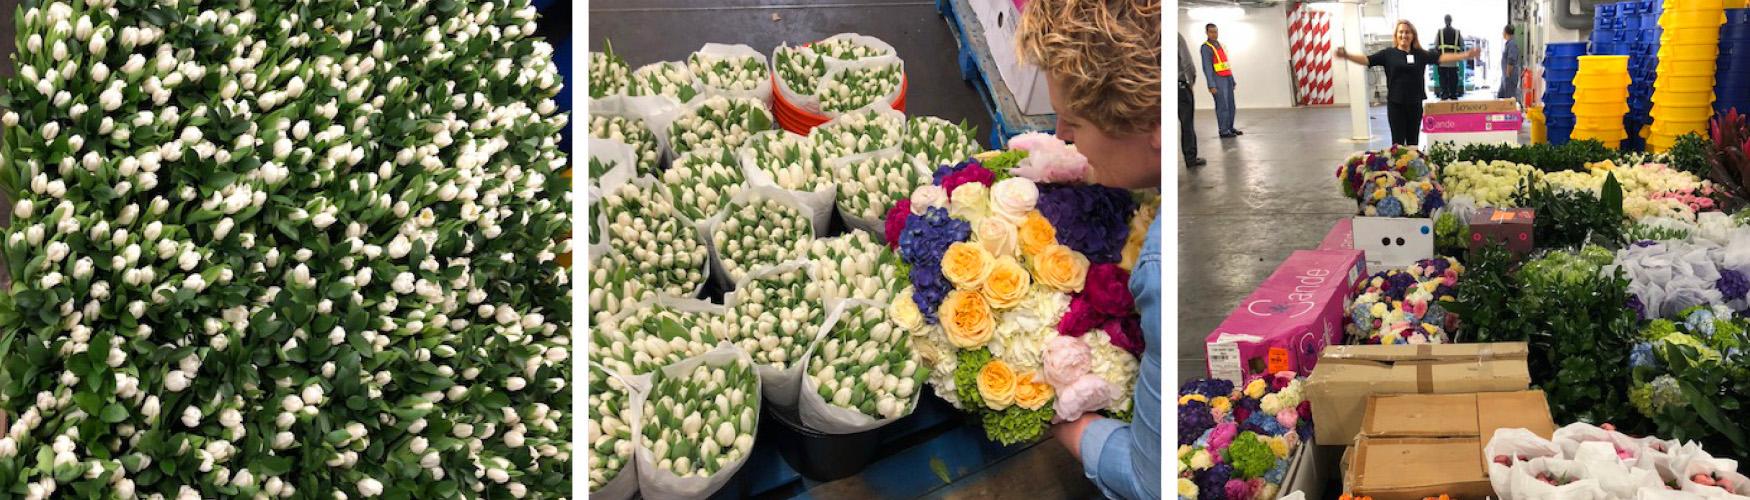 Cruise-Ship-Flowers-Oprah-Holland-America-3.jpg